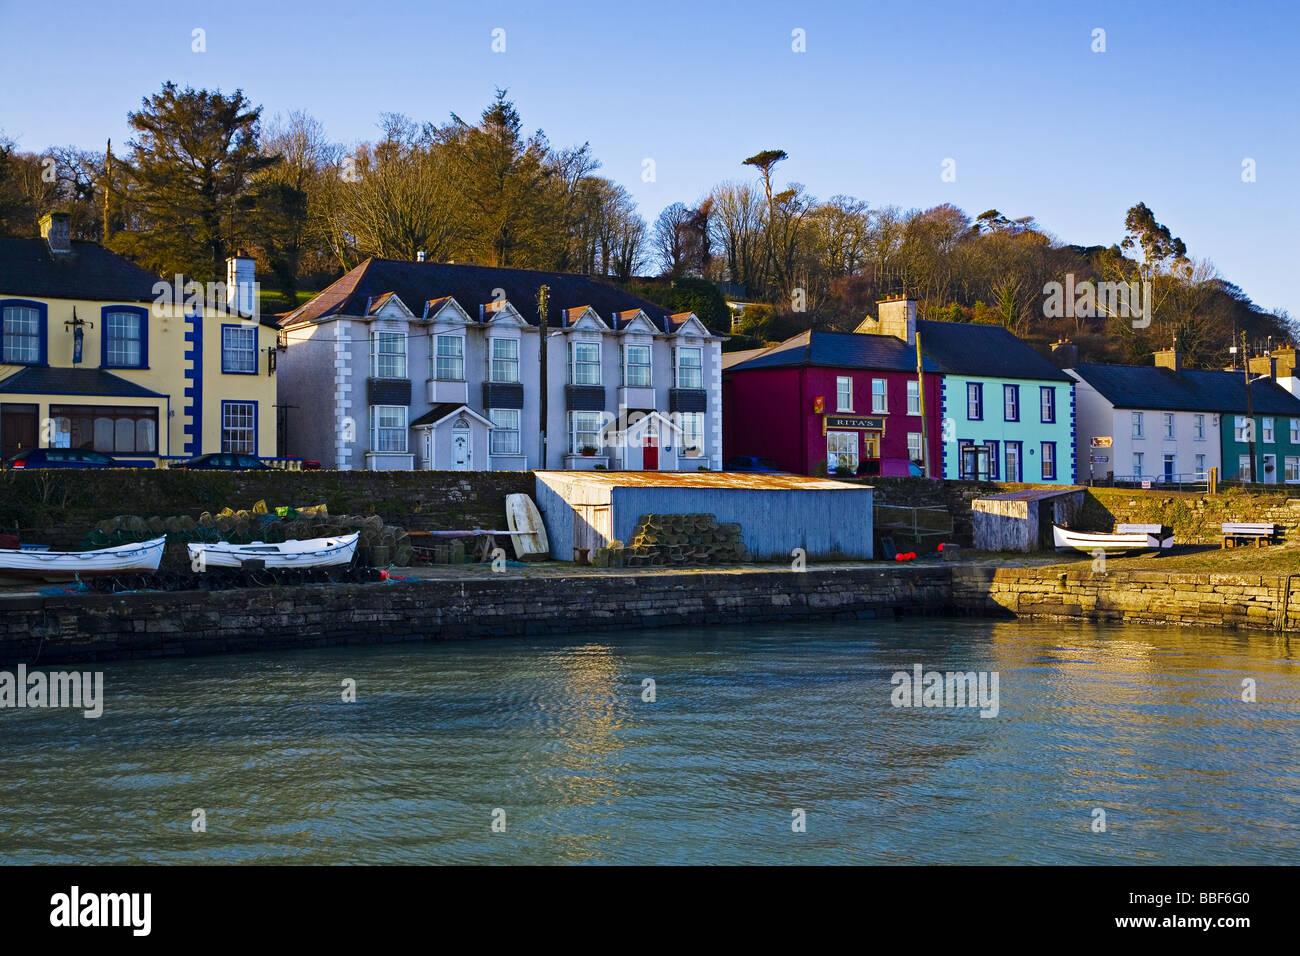 Courtmacsherry harbour town West Cork Ireland. - Stock Image